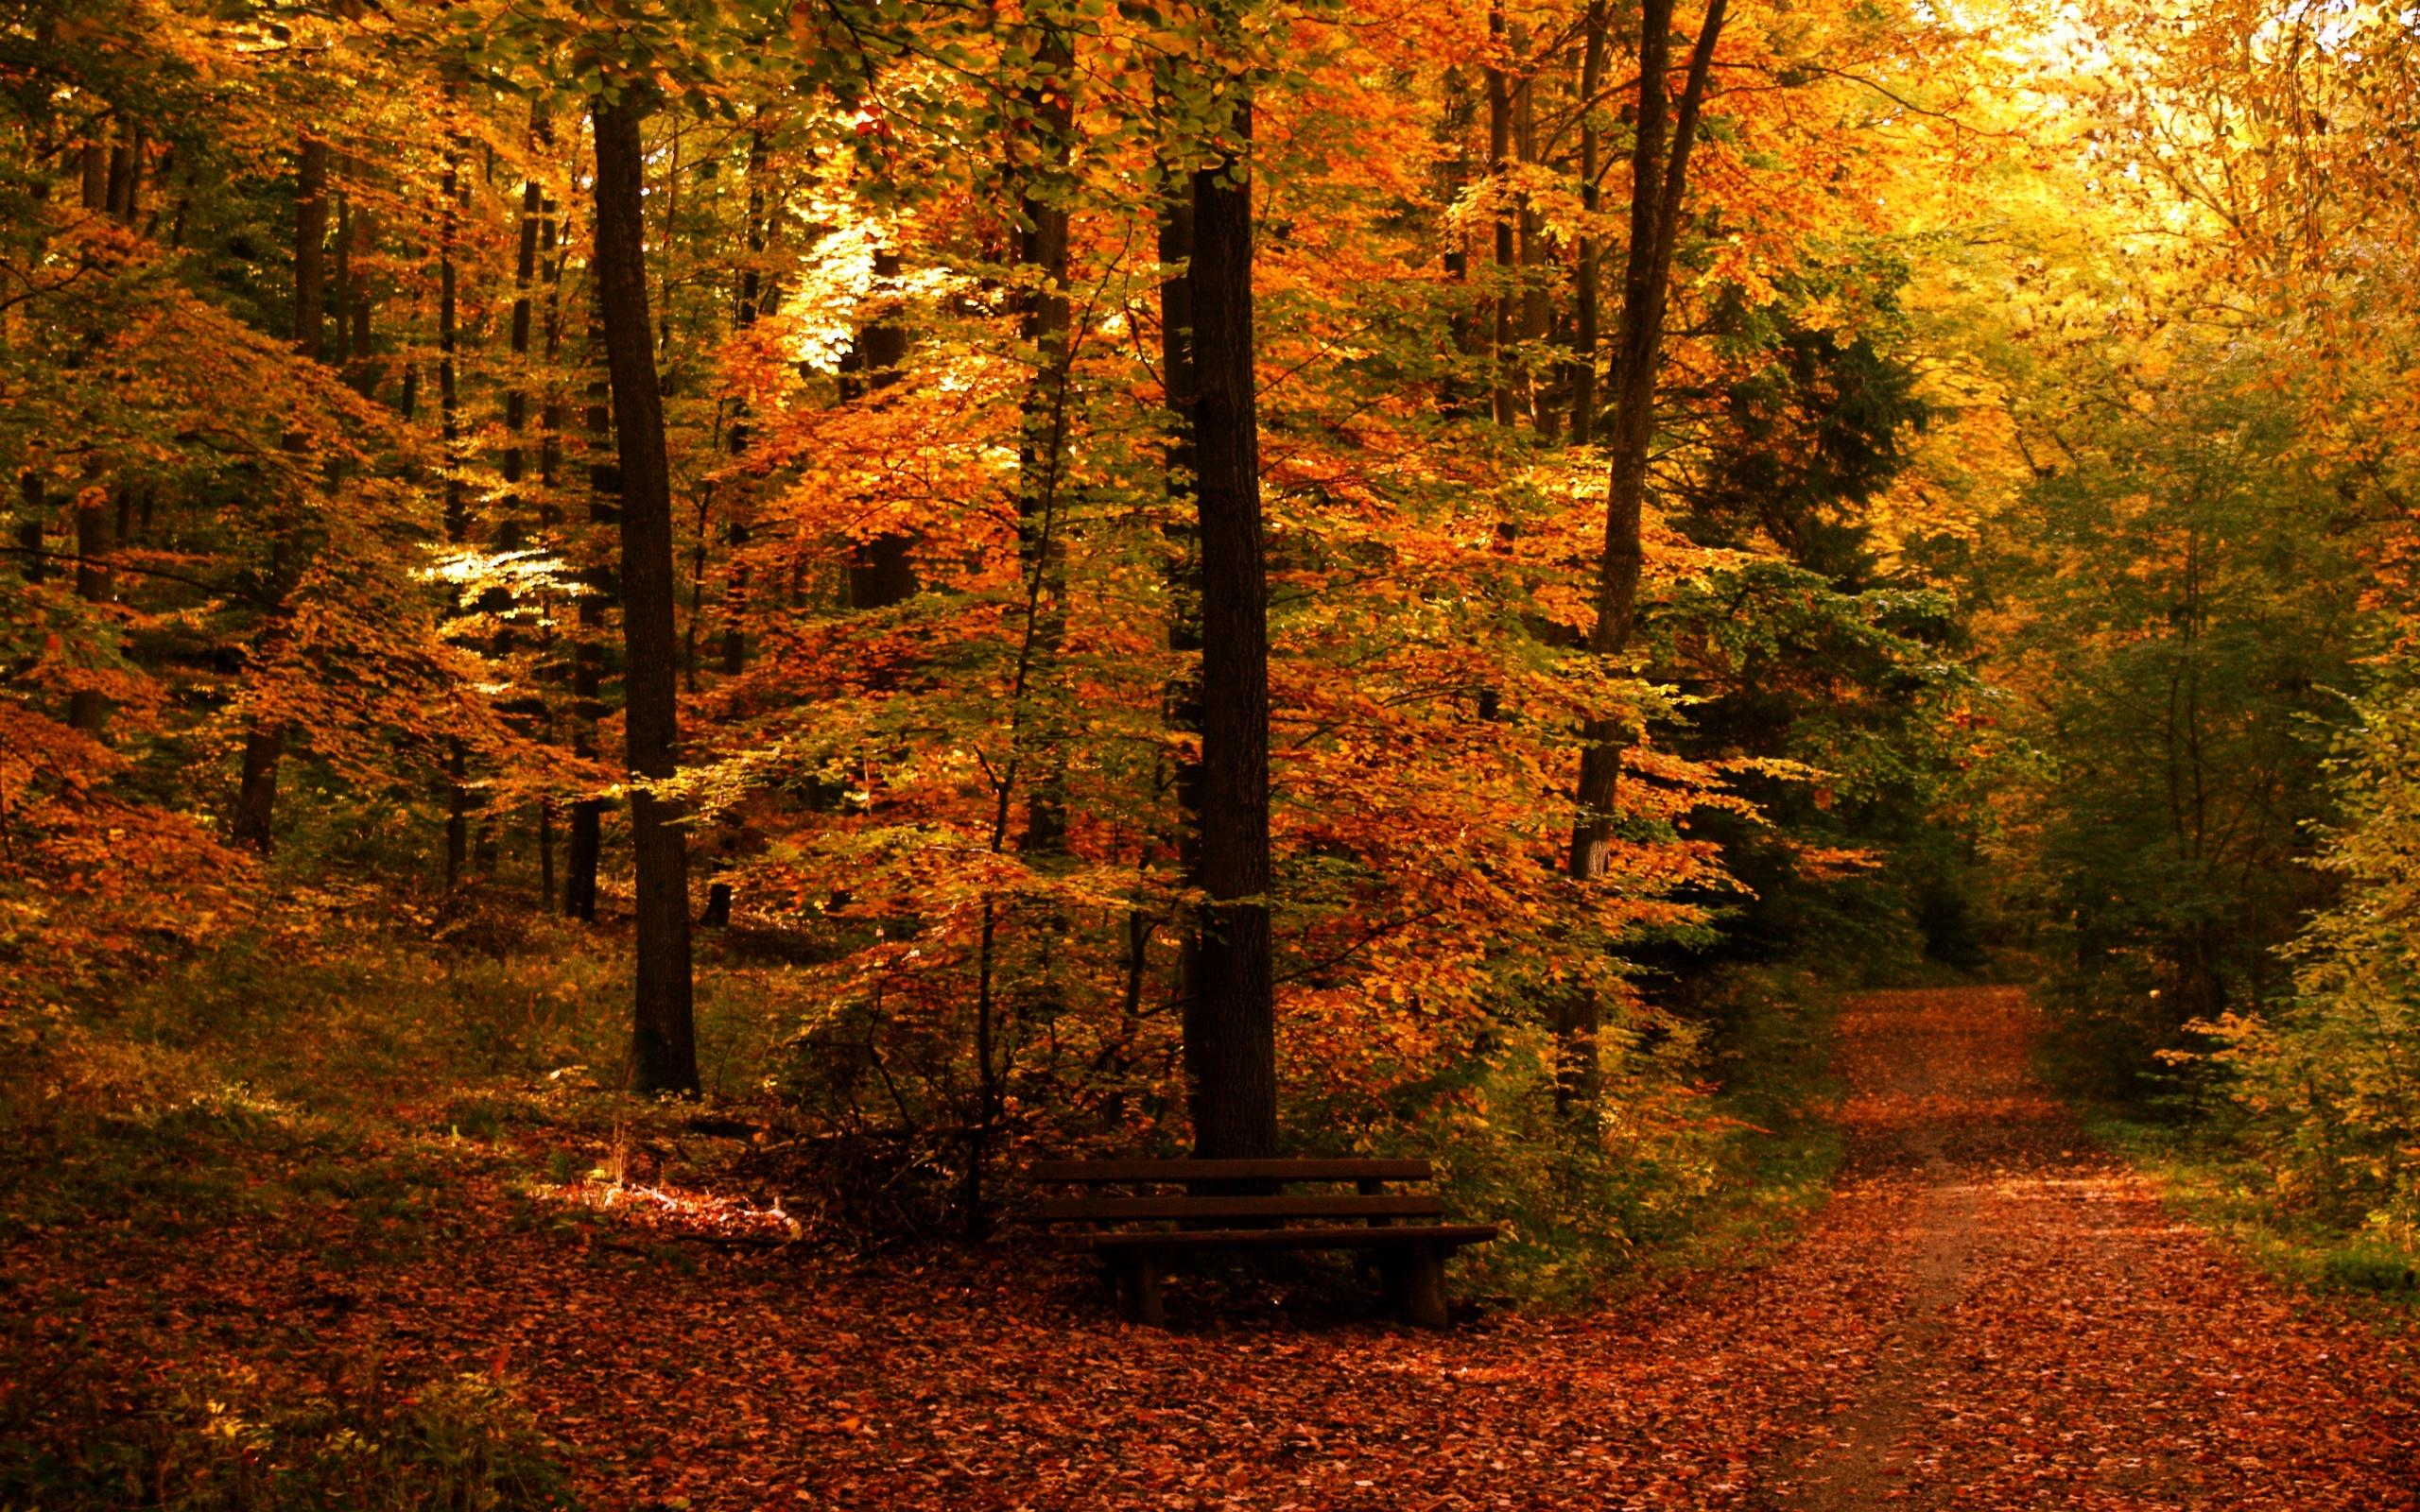 Fall Full HD Wallpaper and Background 2560x1600 ID165266 2560x1600